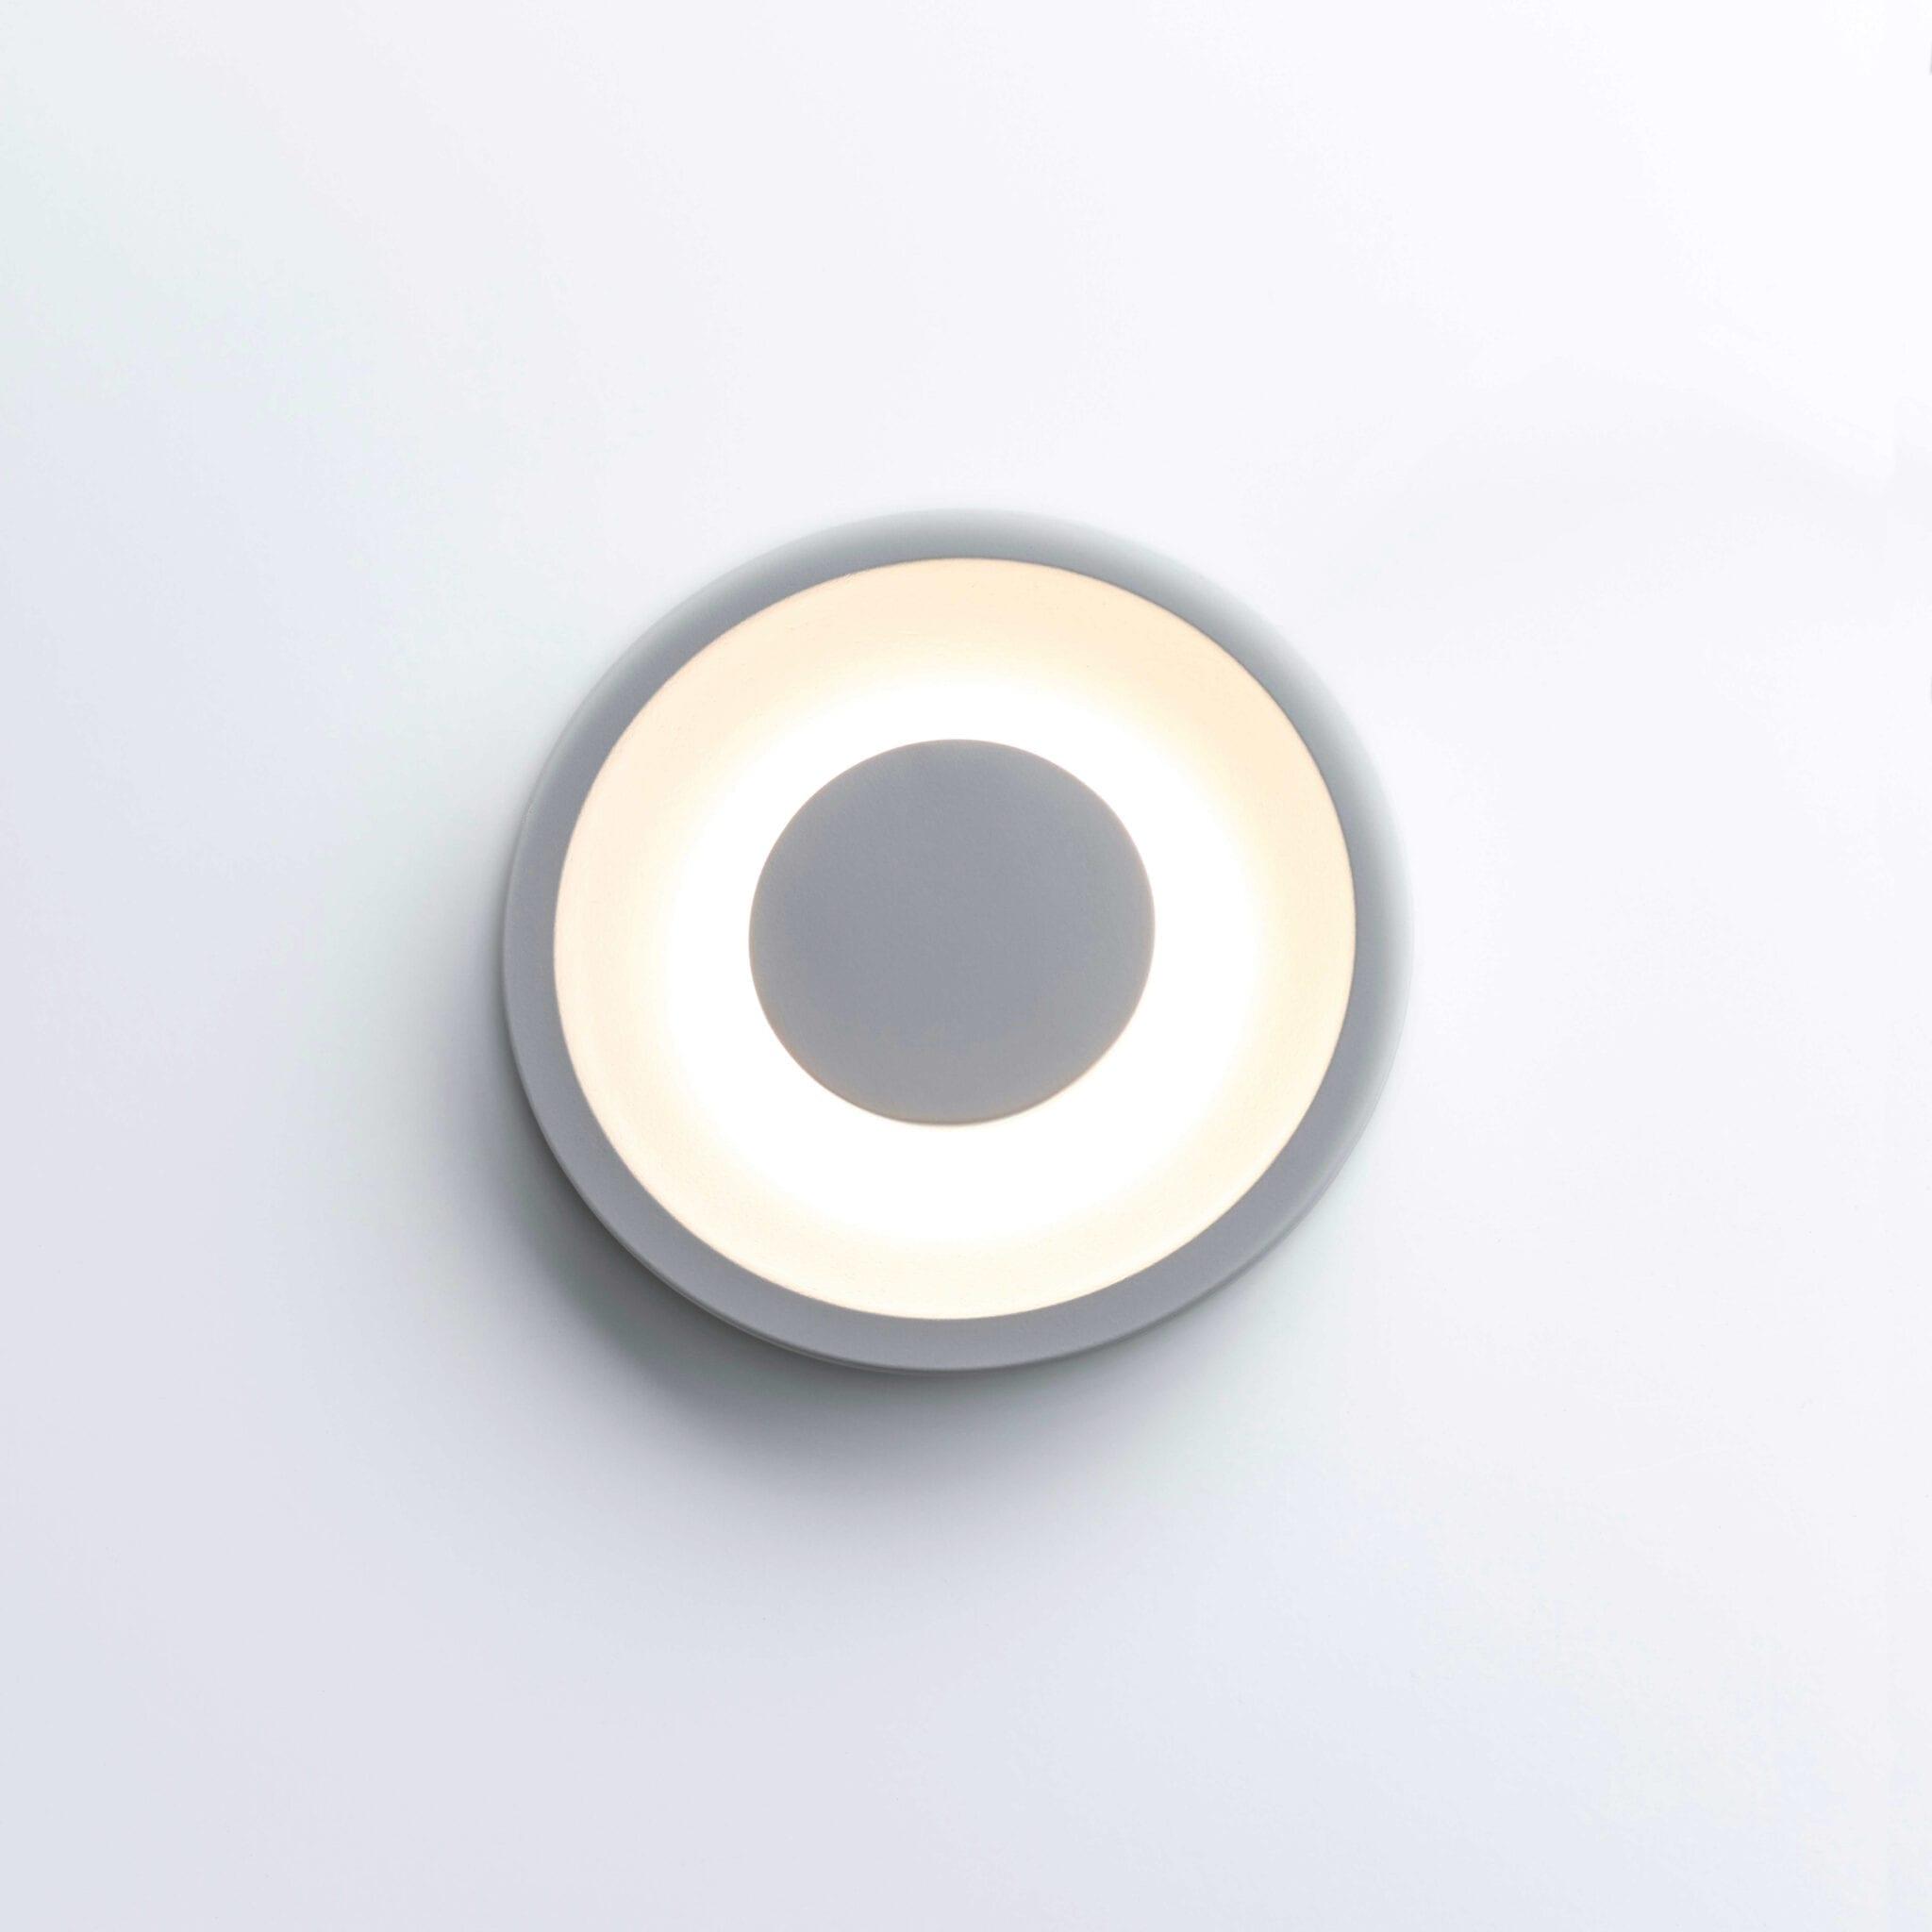 Orbit møbelspot LED 12V DC 3,6W